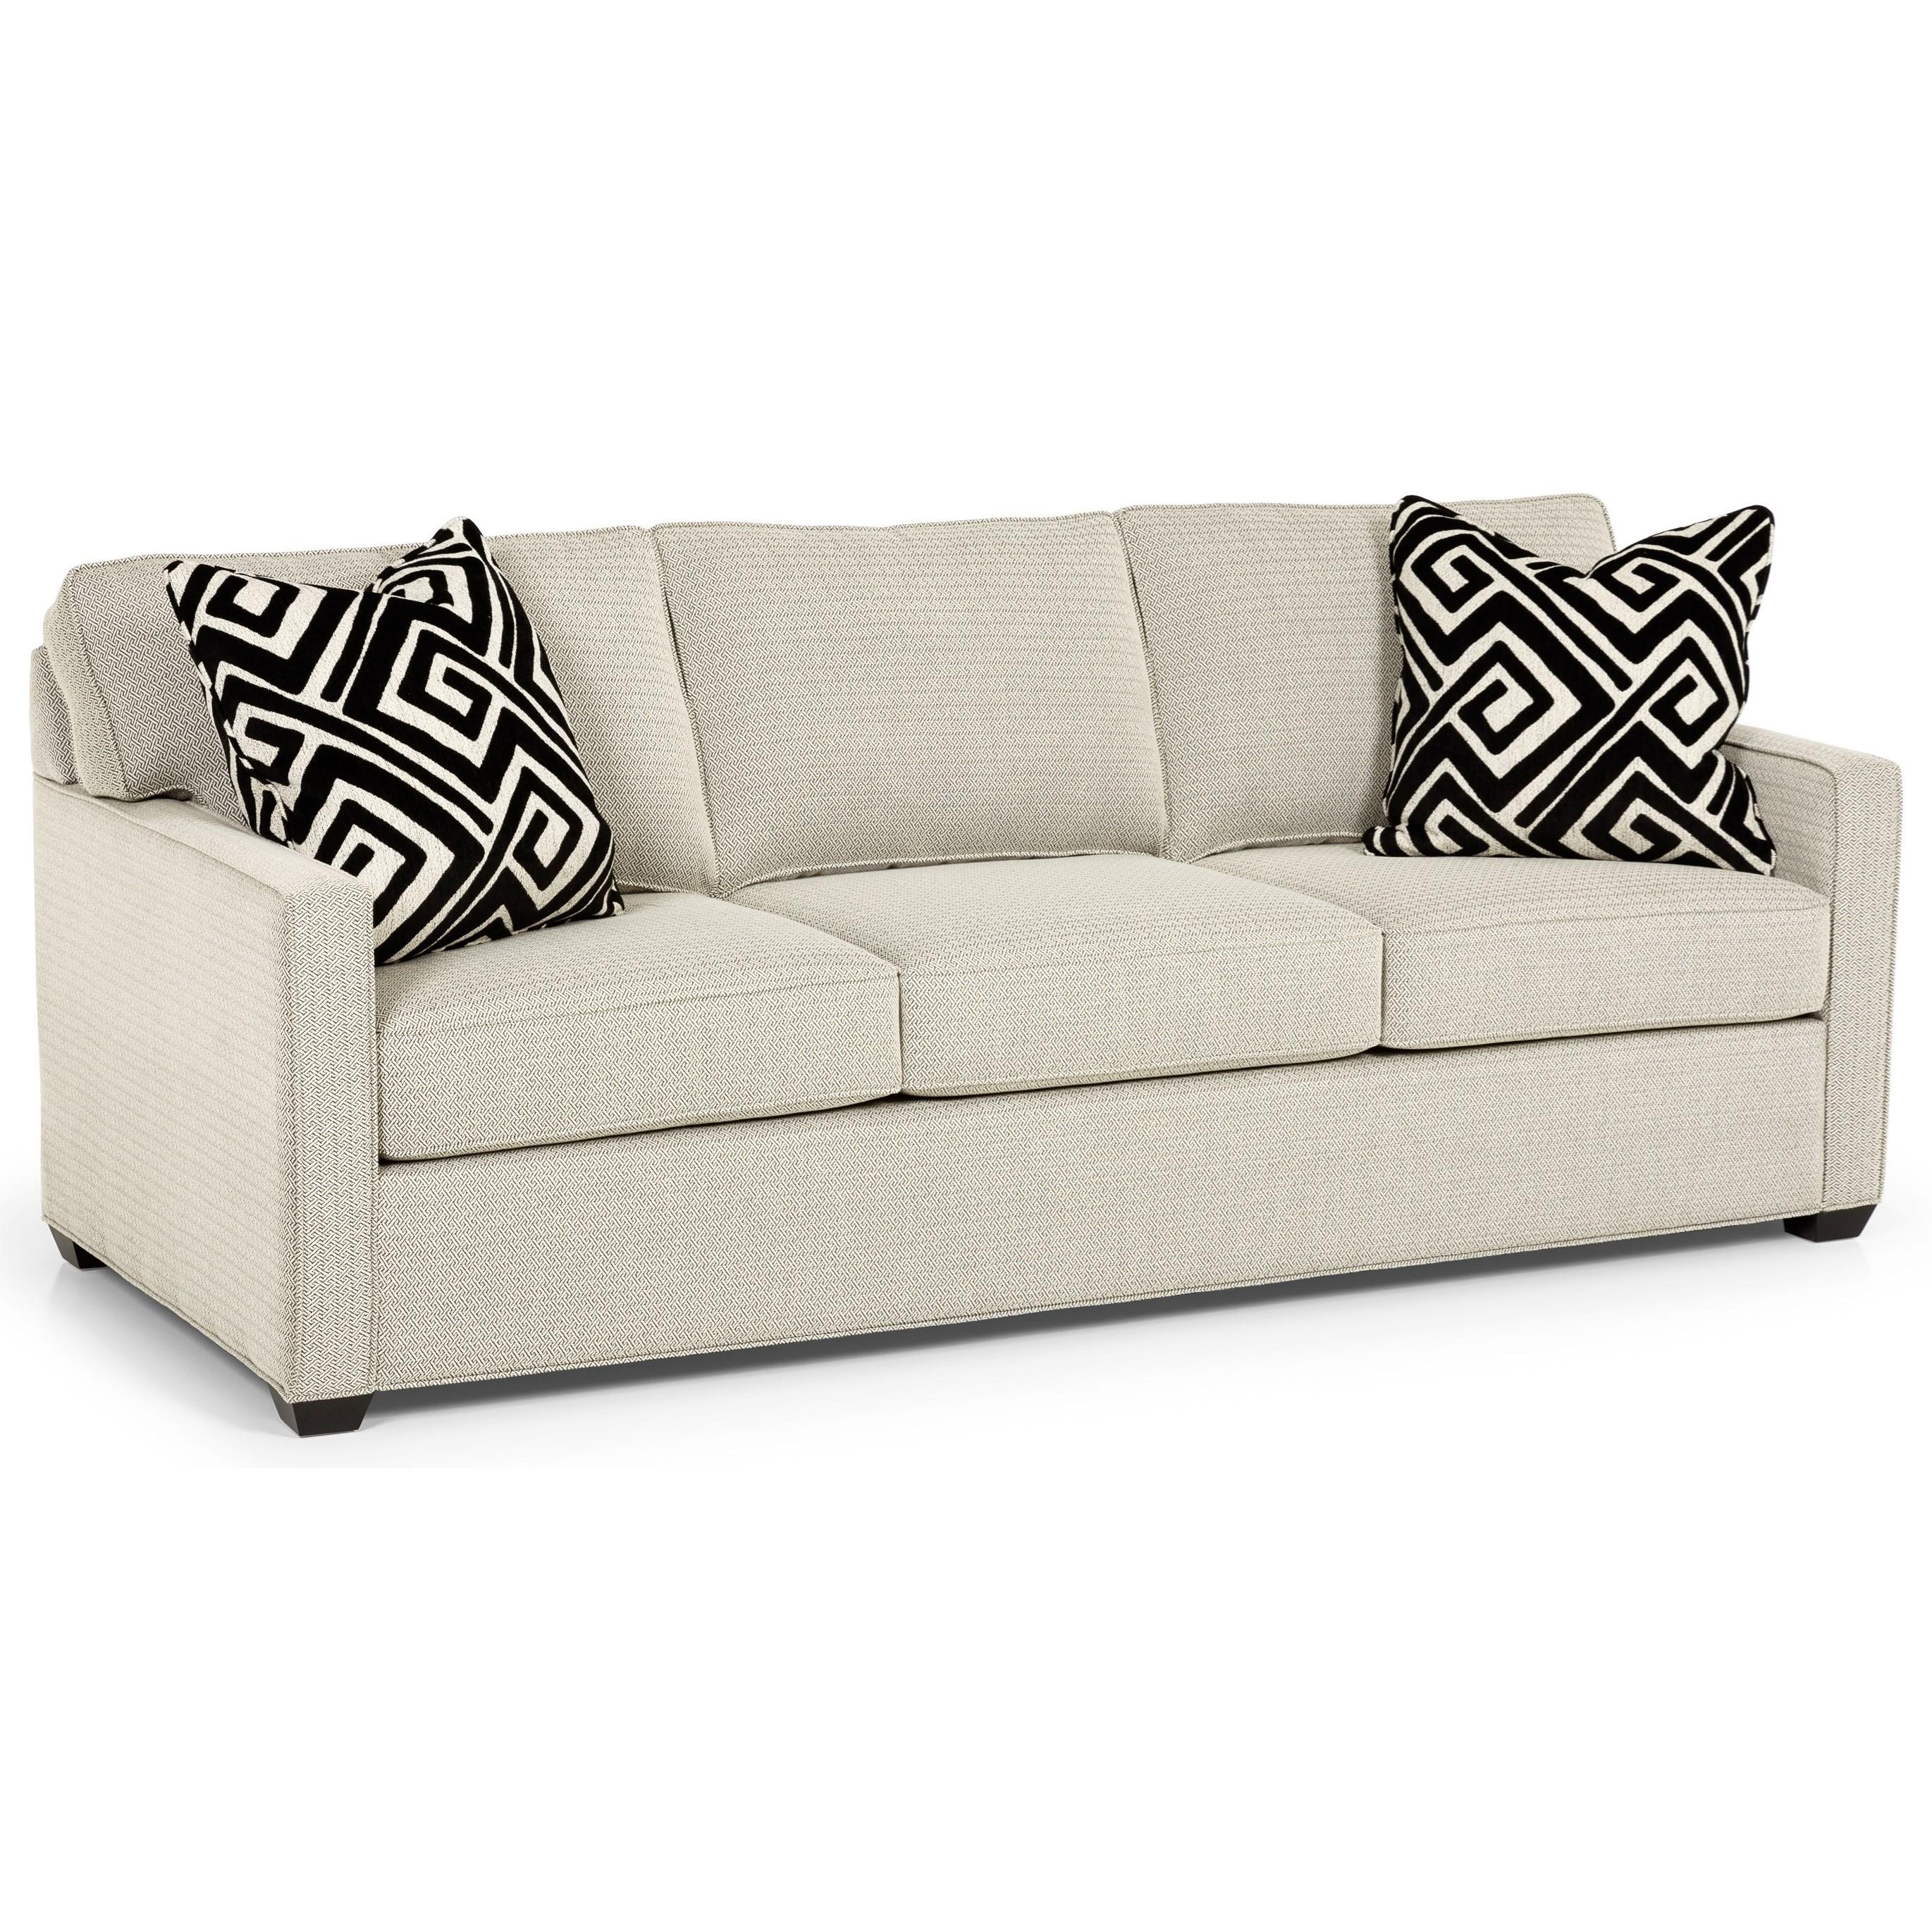 Stanton 287 Queen Basic Sleeper Sofa - Item Number: 287-15B